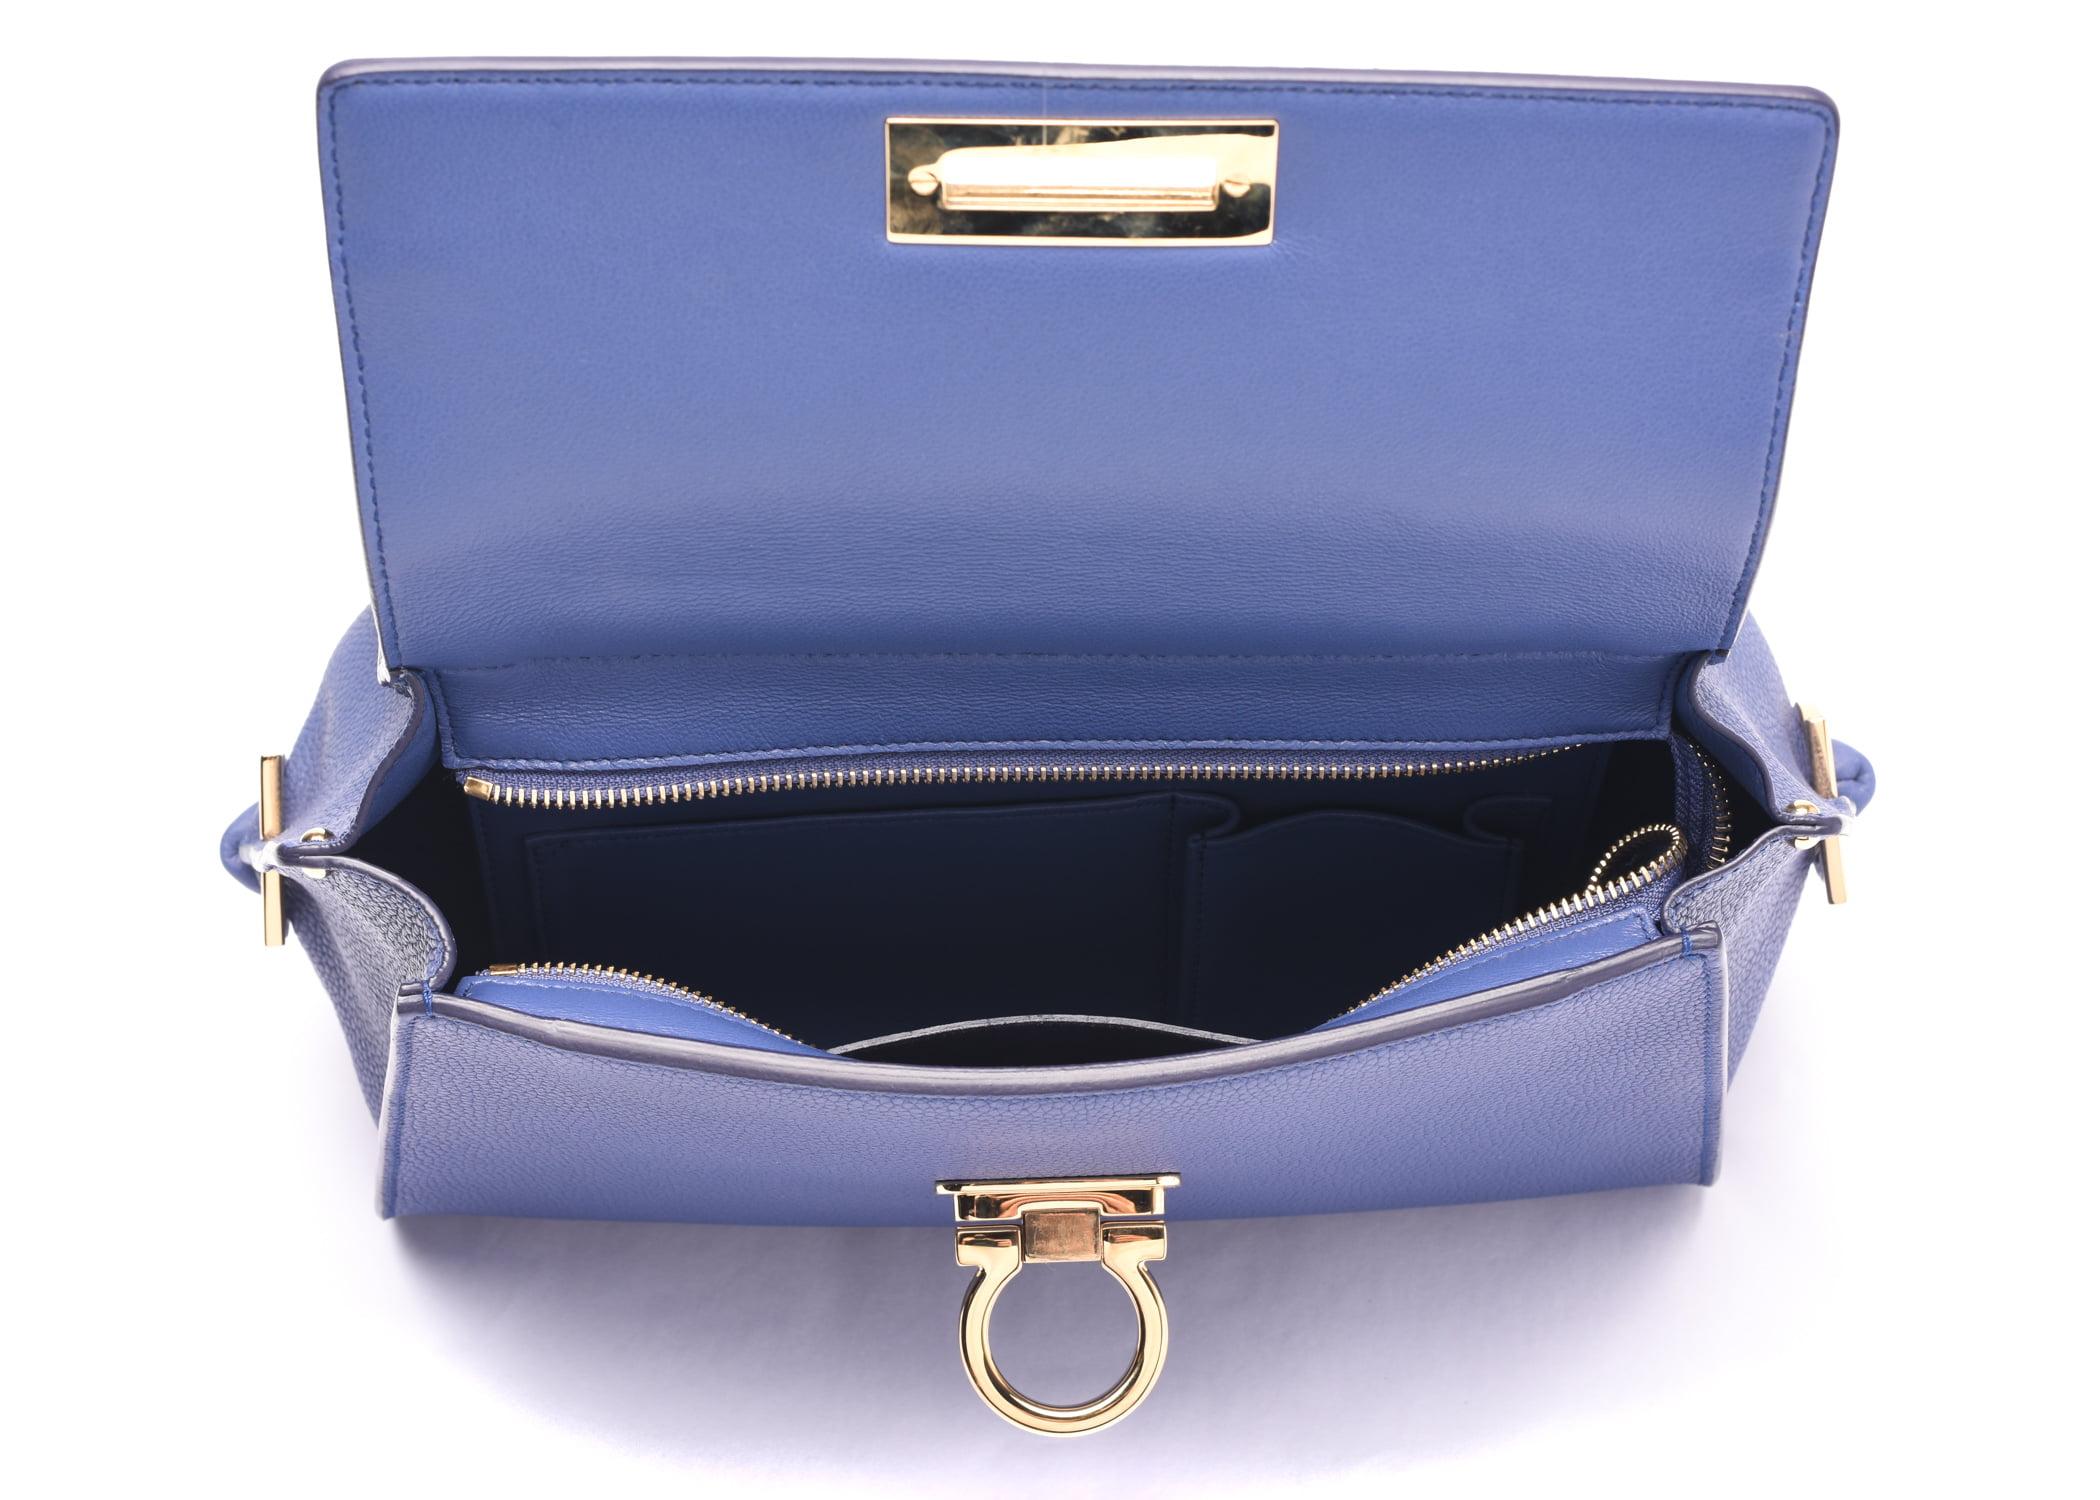 6dba0ee08efa Salvatore Ferragamo - Salvatore Ferragamo Sofia Leather Satchel Handbag 21  E530 22 Blue - Walmart.com